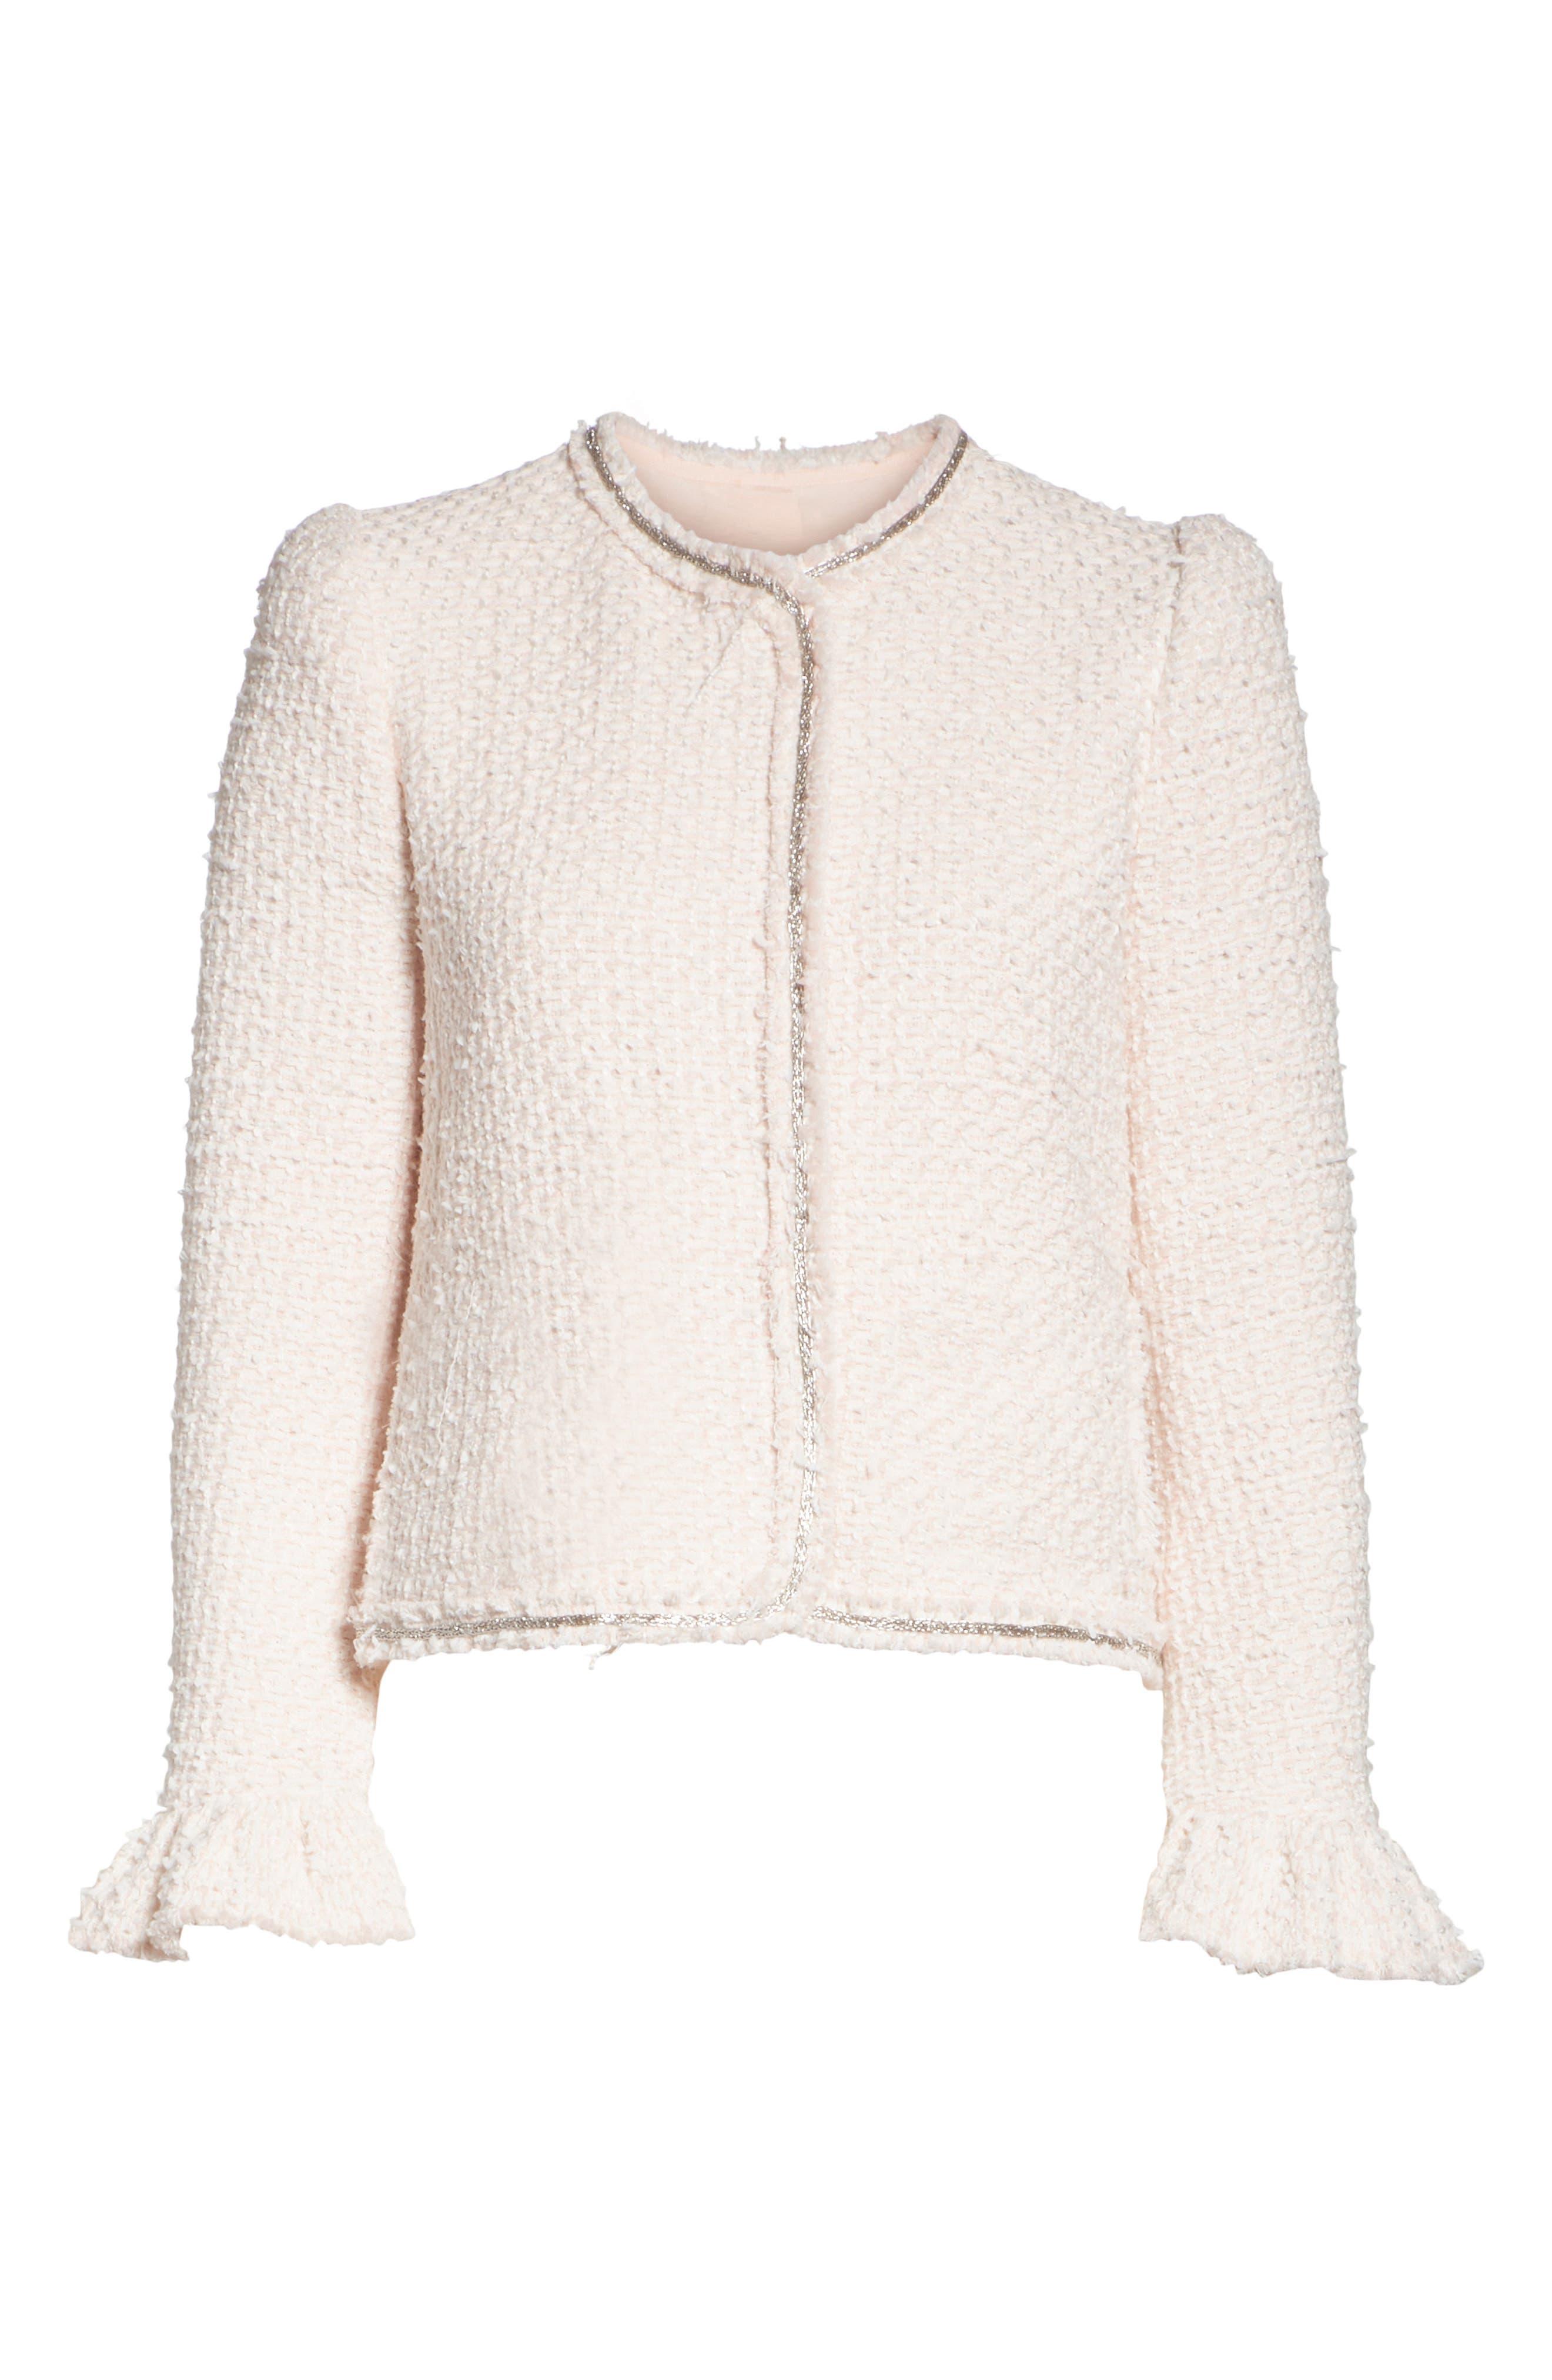 Ruffle Sleeve Tweed Jacket,                             Alternate thumbnail 5, color,                             POWDER PINK COMBO